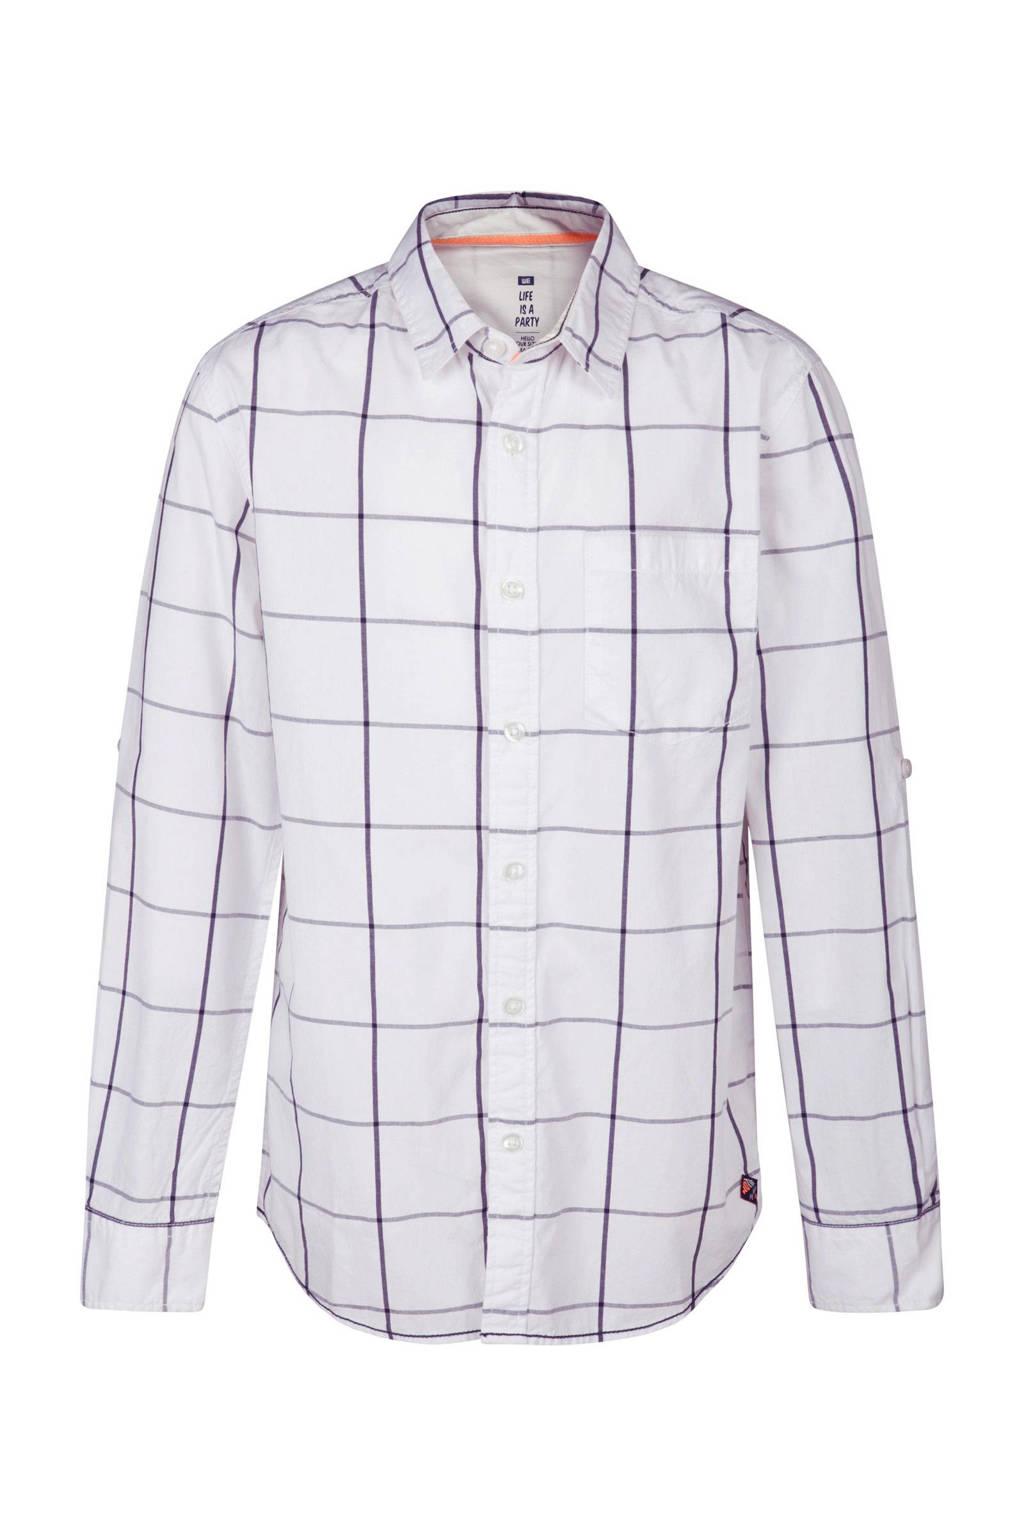 WE Fashion regular fit overhemd met ruitprint wit, Wit